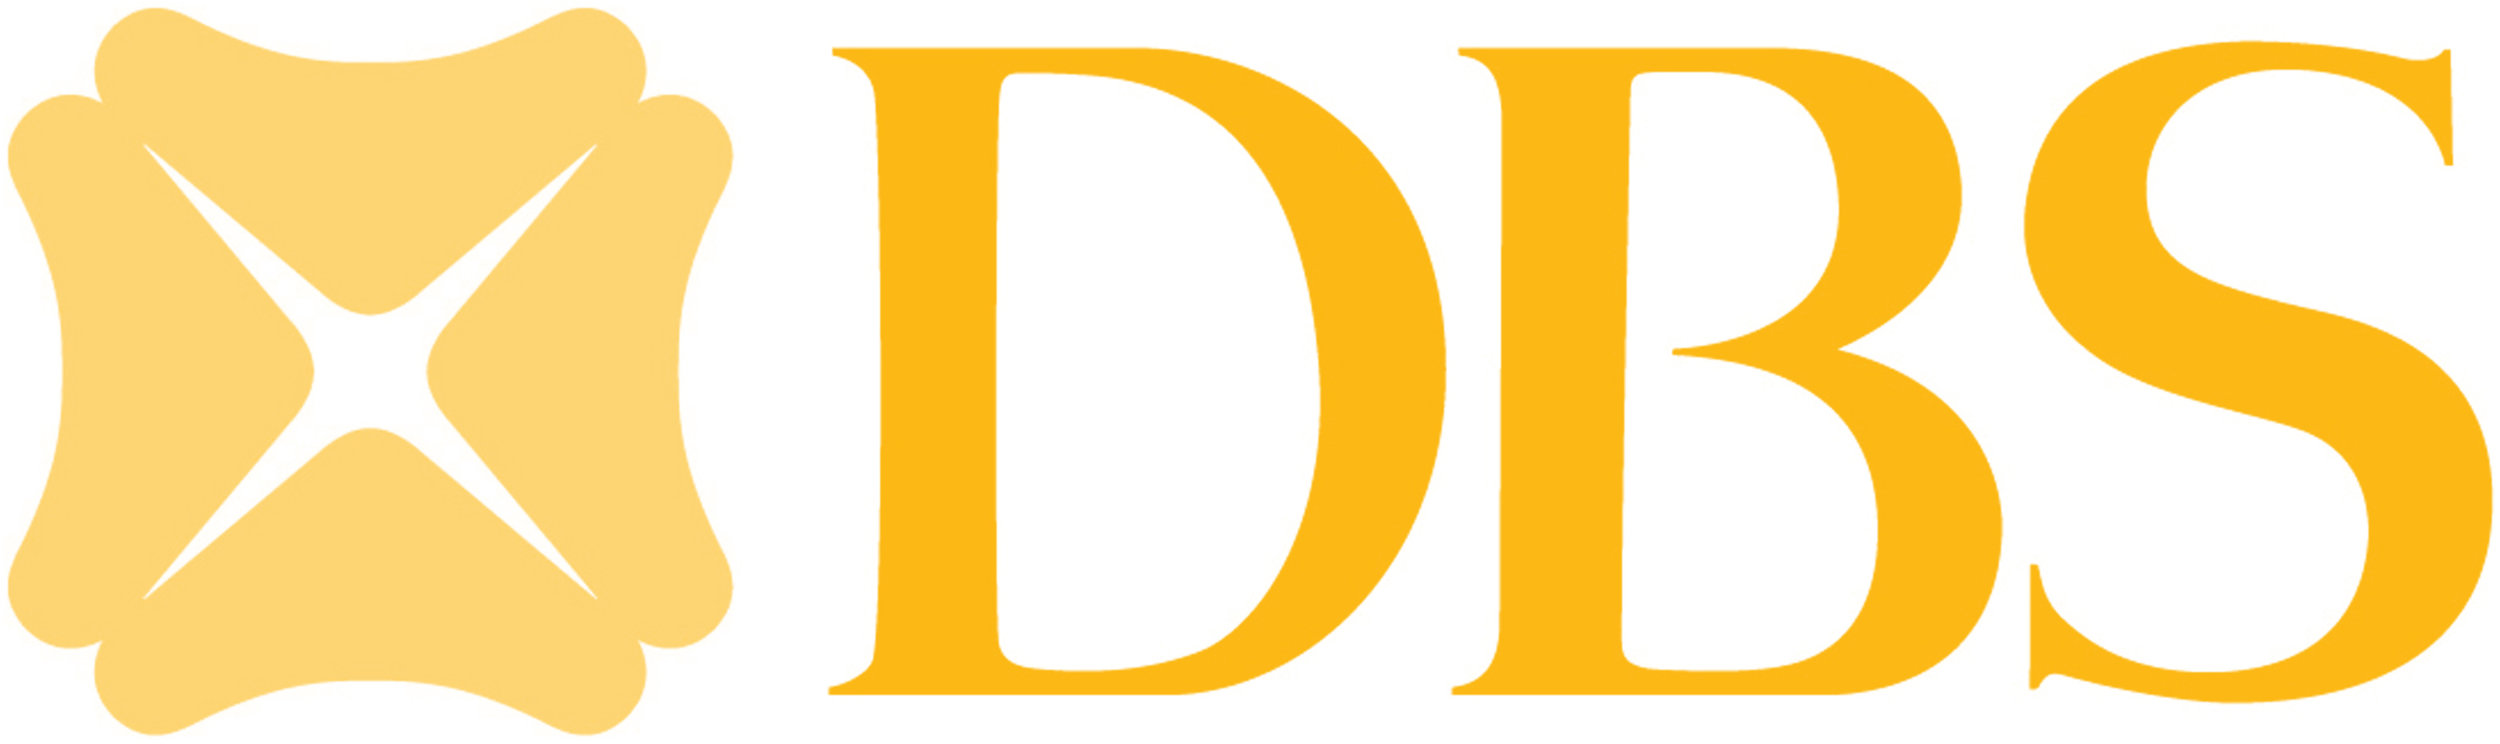 dbs-bank-logo_orange.JPG